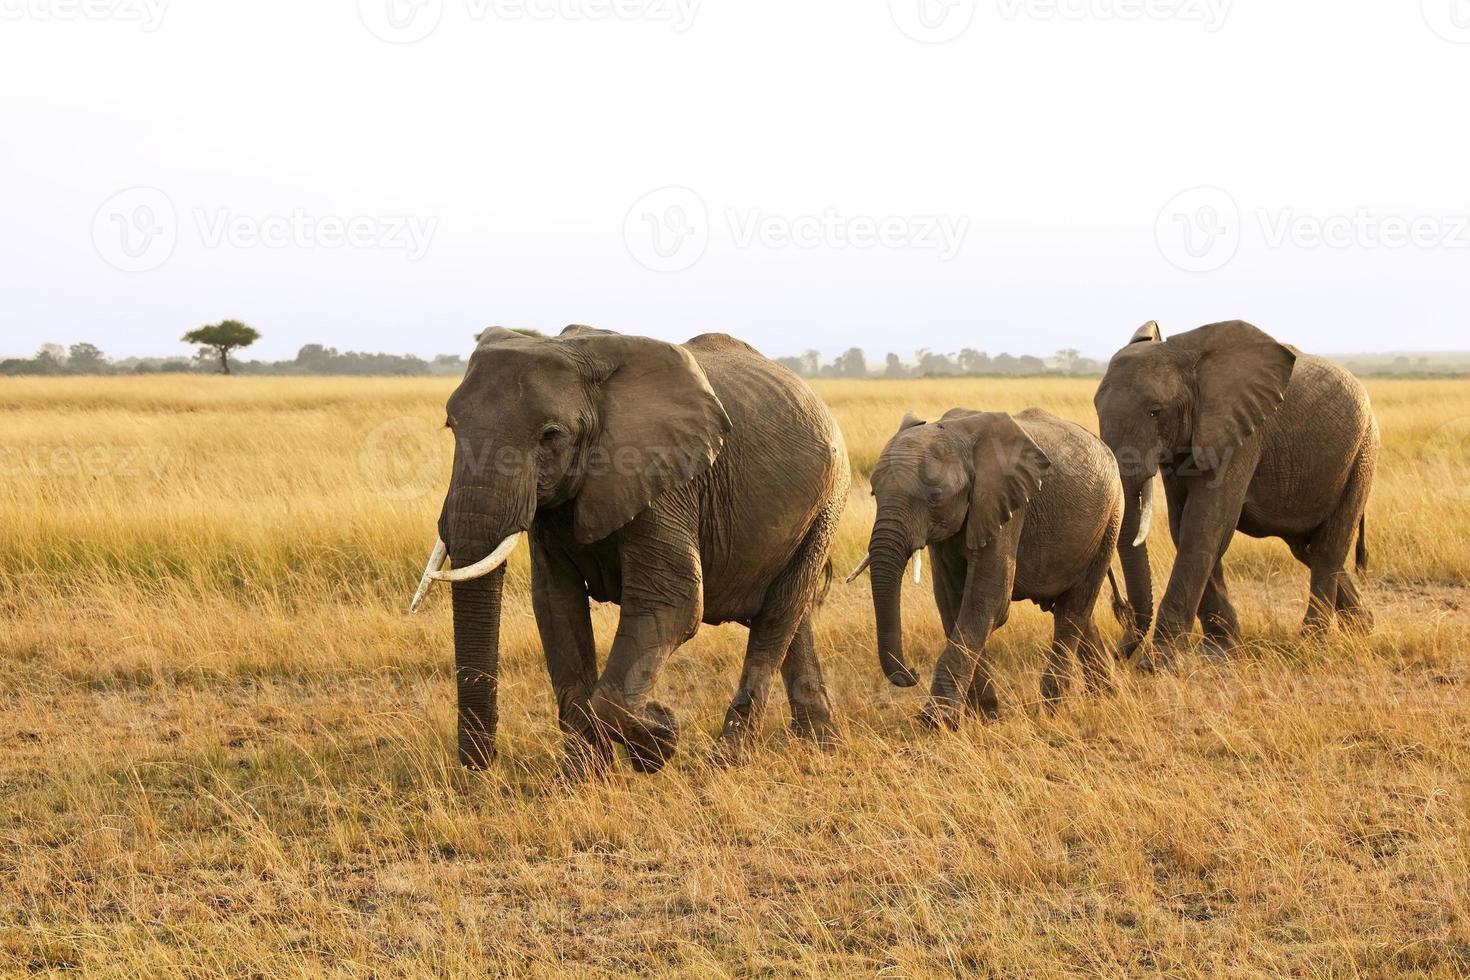 Masai Mara Elephants photo